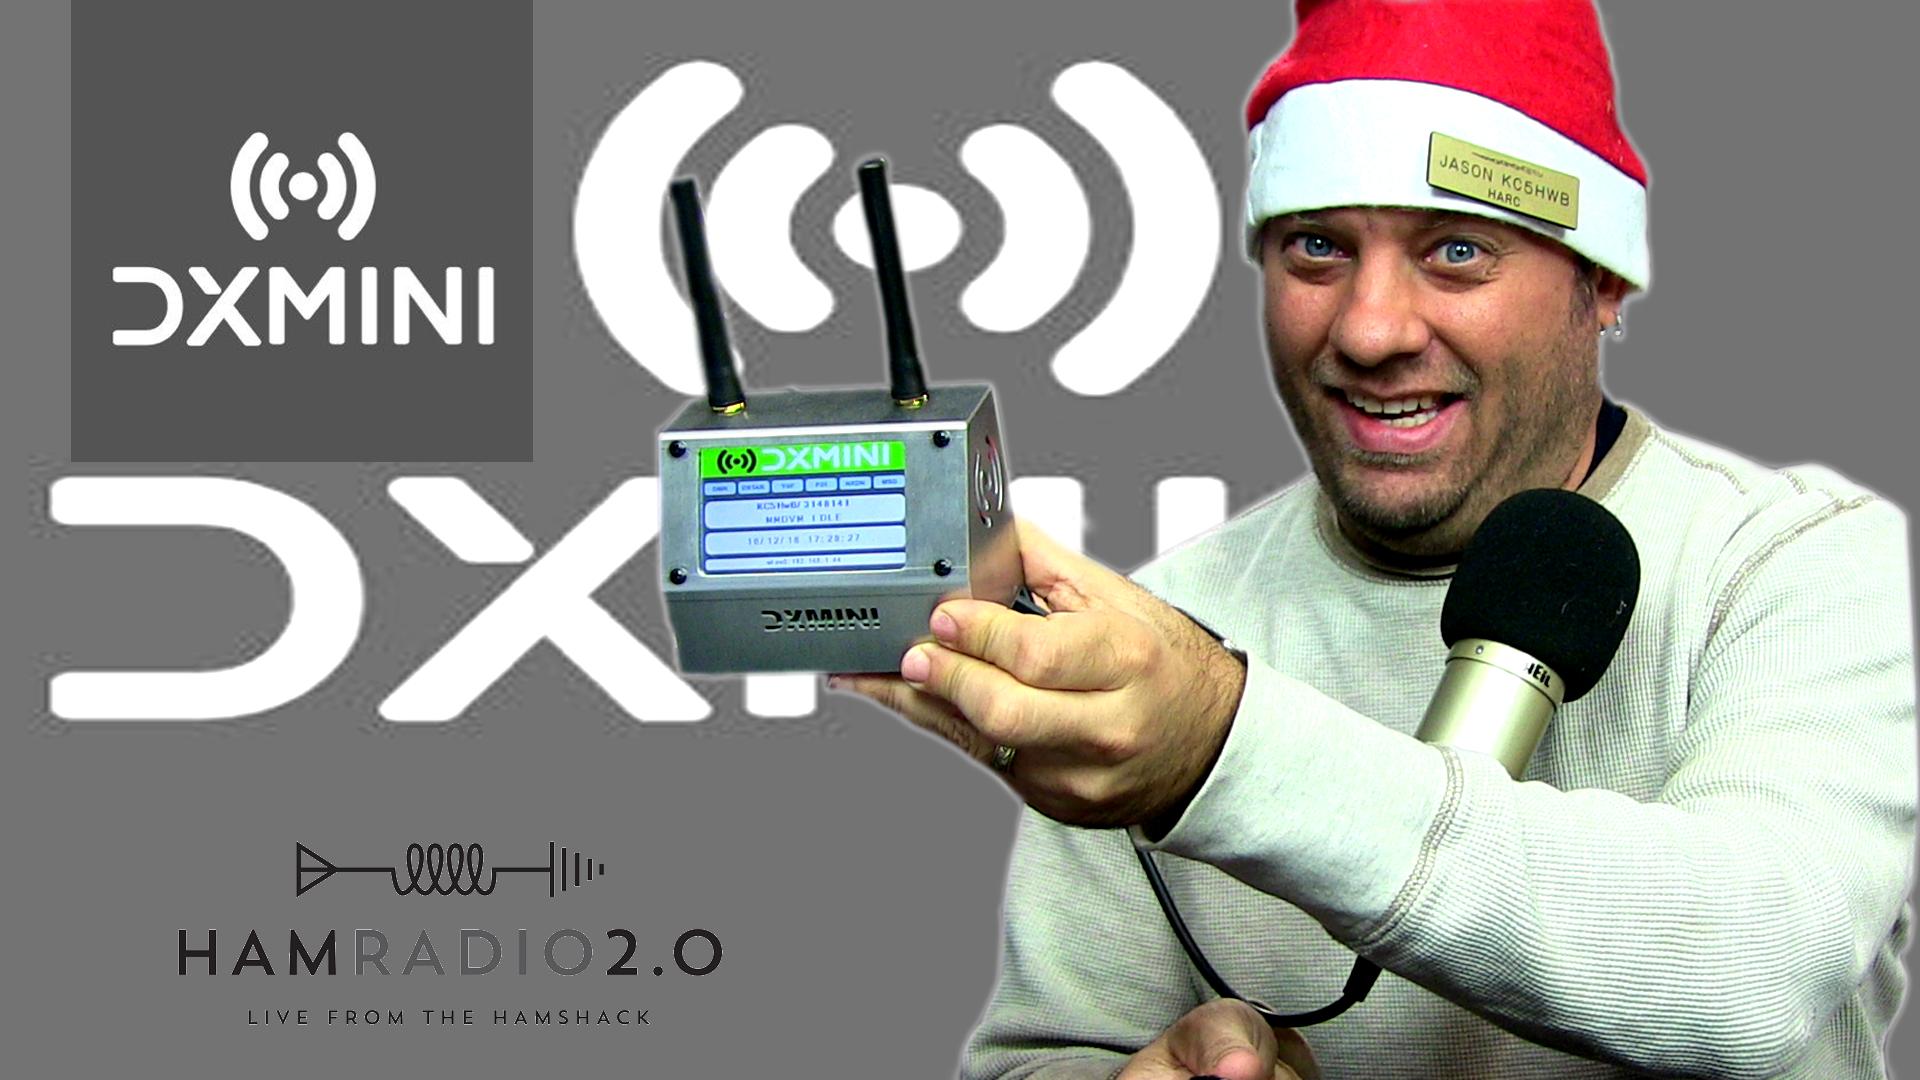 Episode 172: DXMini Pi-Star Hotspot for Amateur Radio